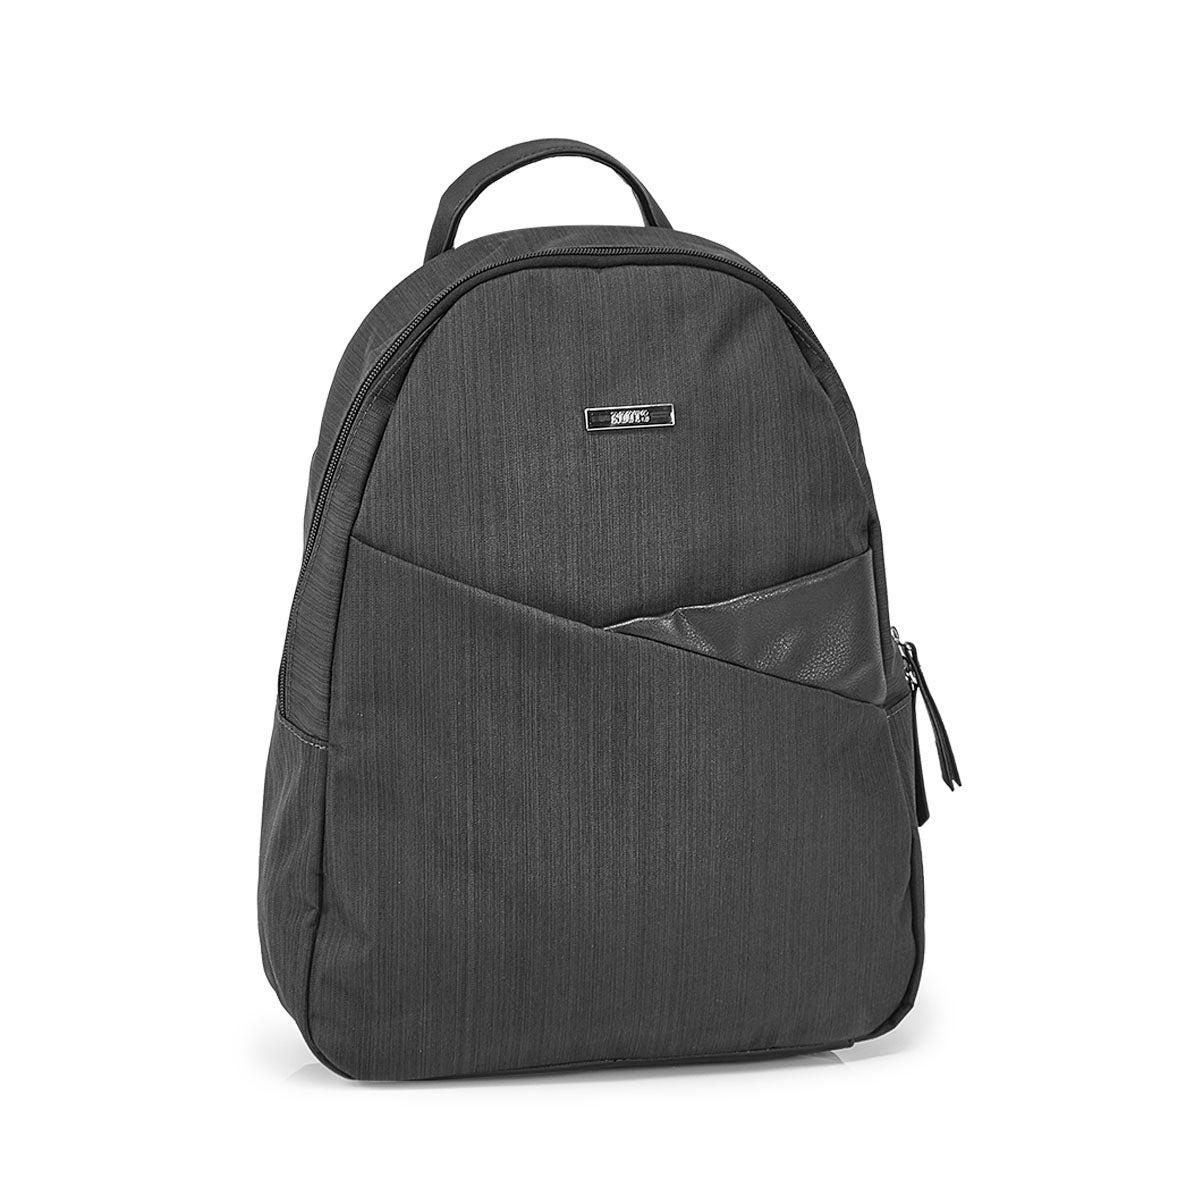 Lds Roots73 blk cross dye mini backpack